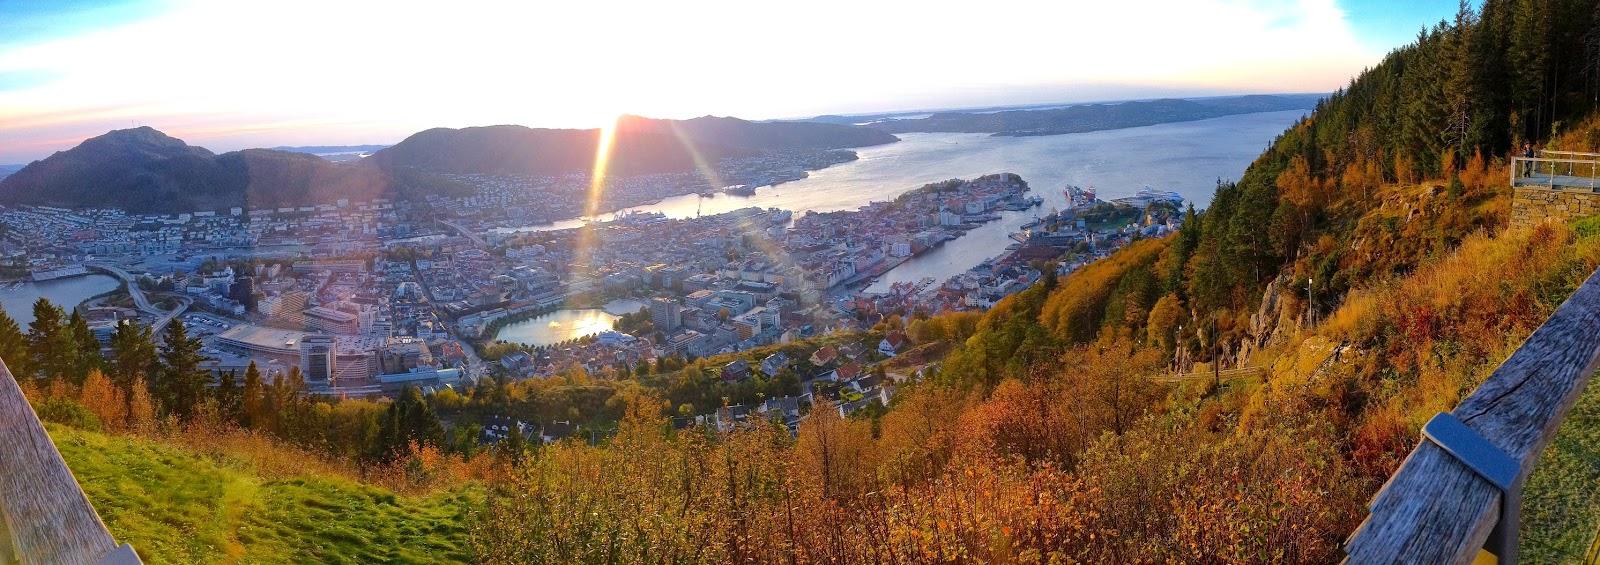 panorama view of Bergen, Norway